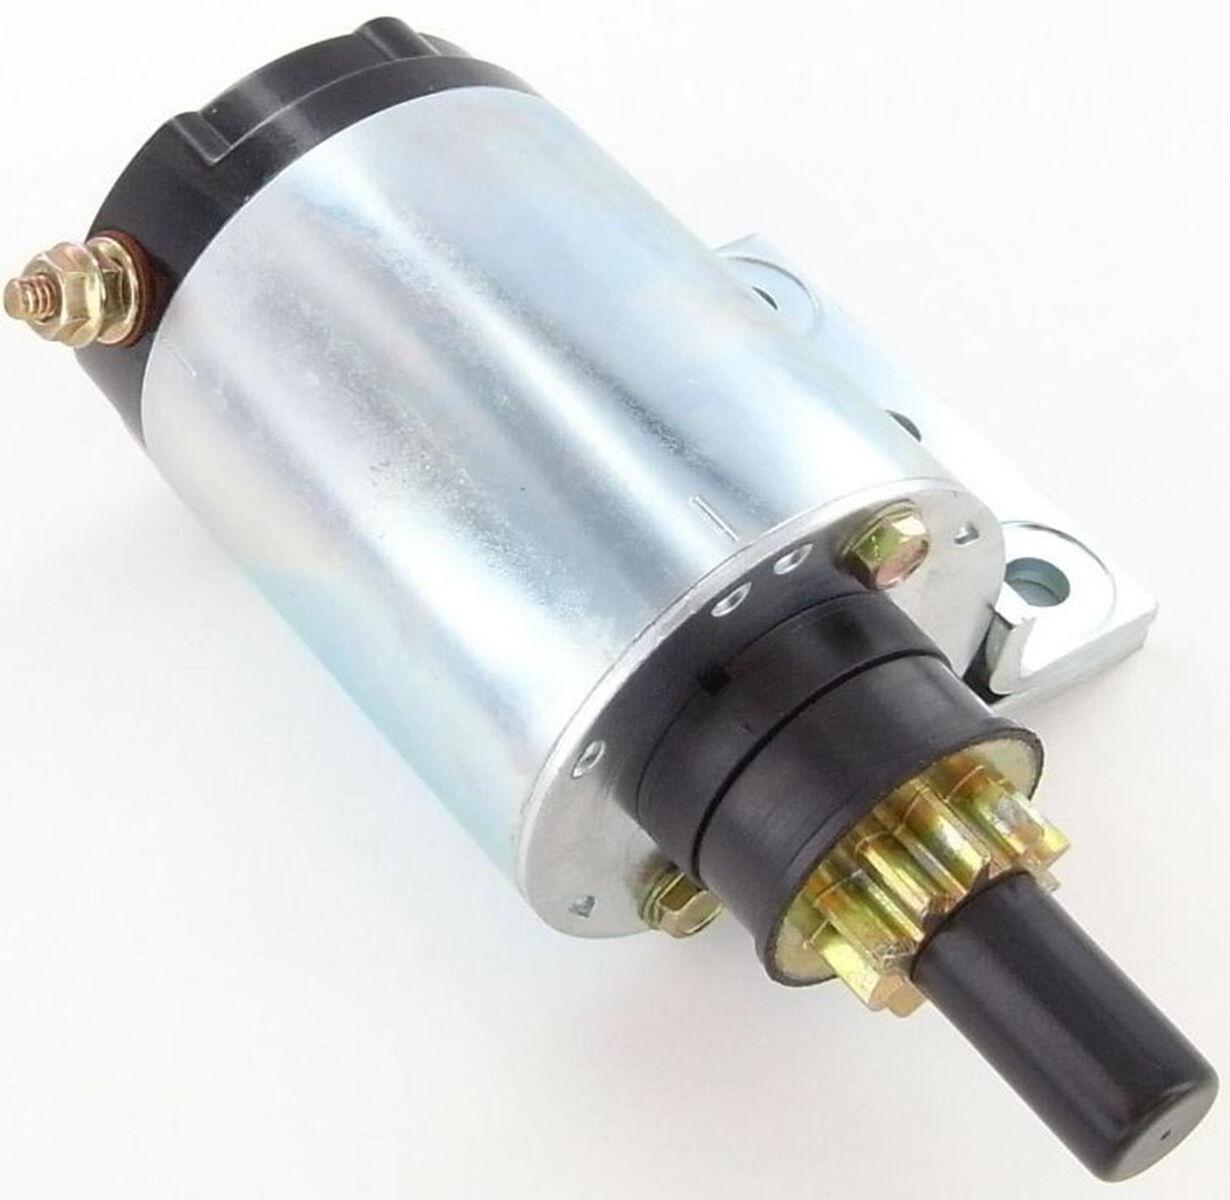 Arrancador de motor John Deere 140 14 HP AM31568 AM32789 AM34248 37869 Kohler 4509807